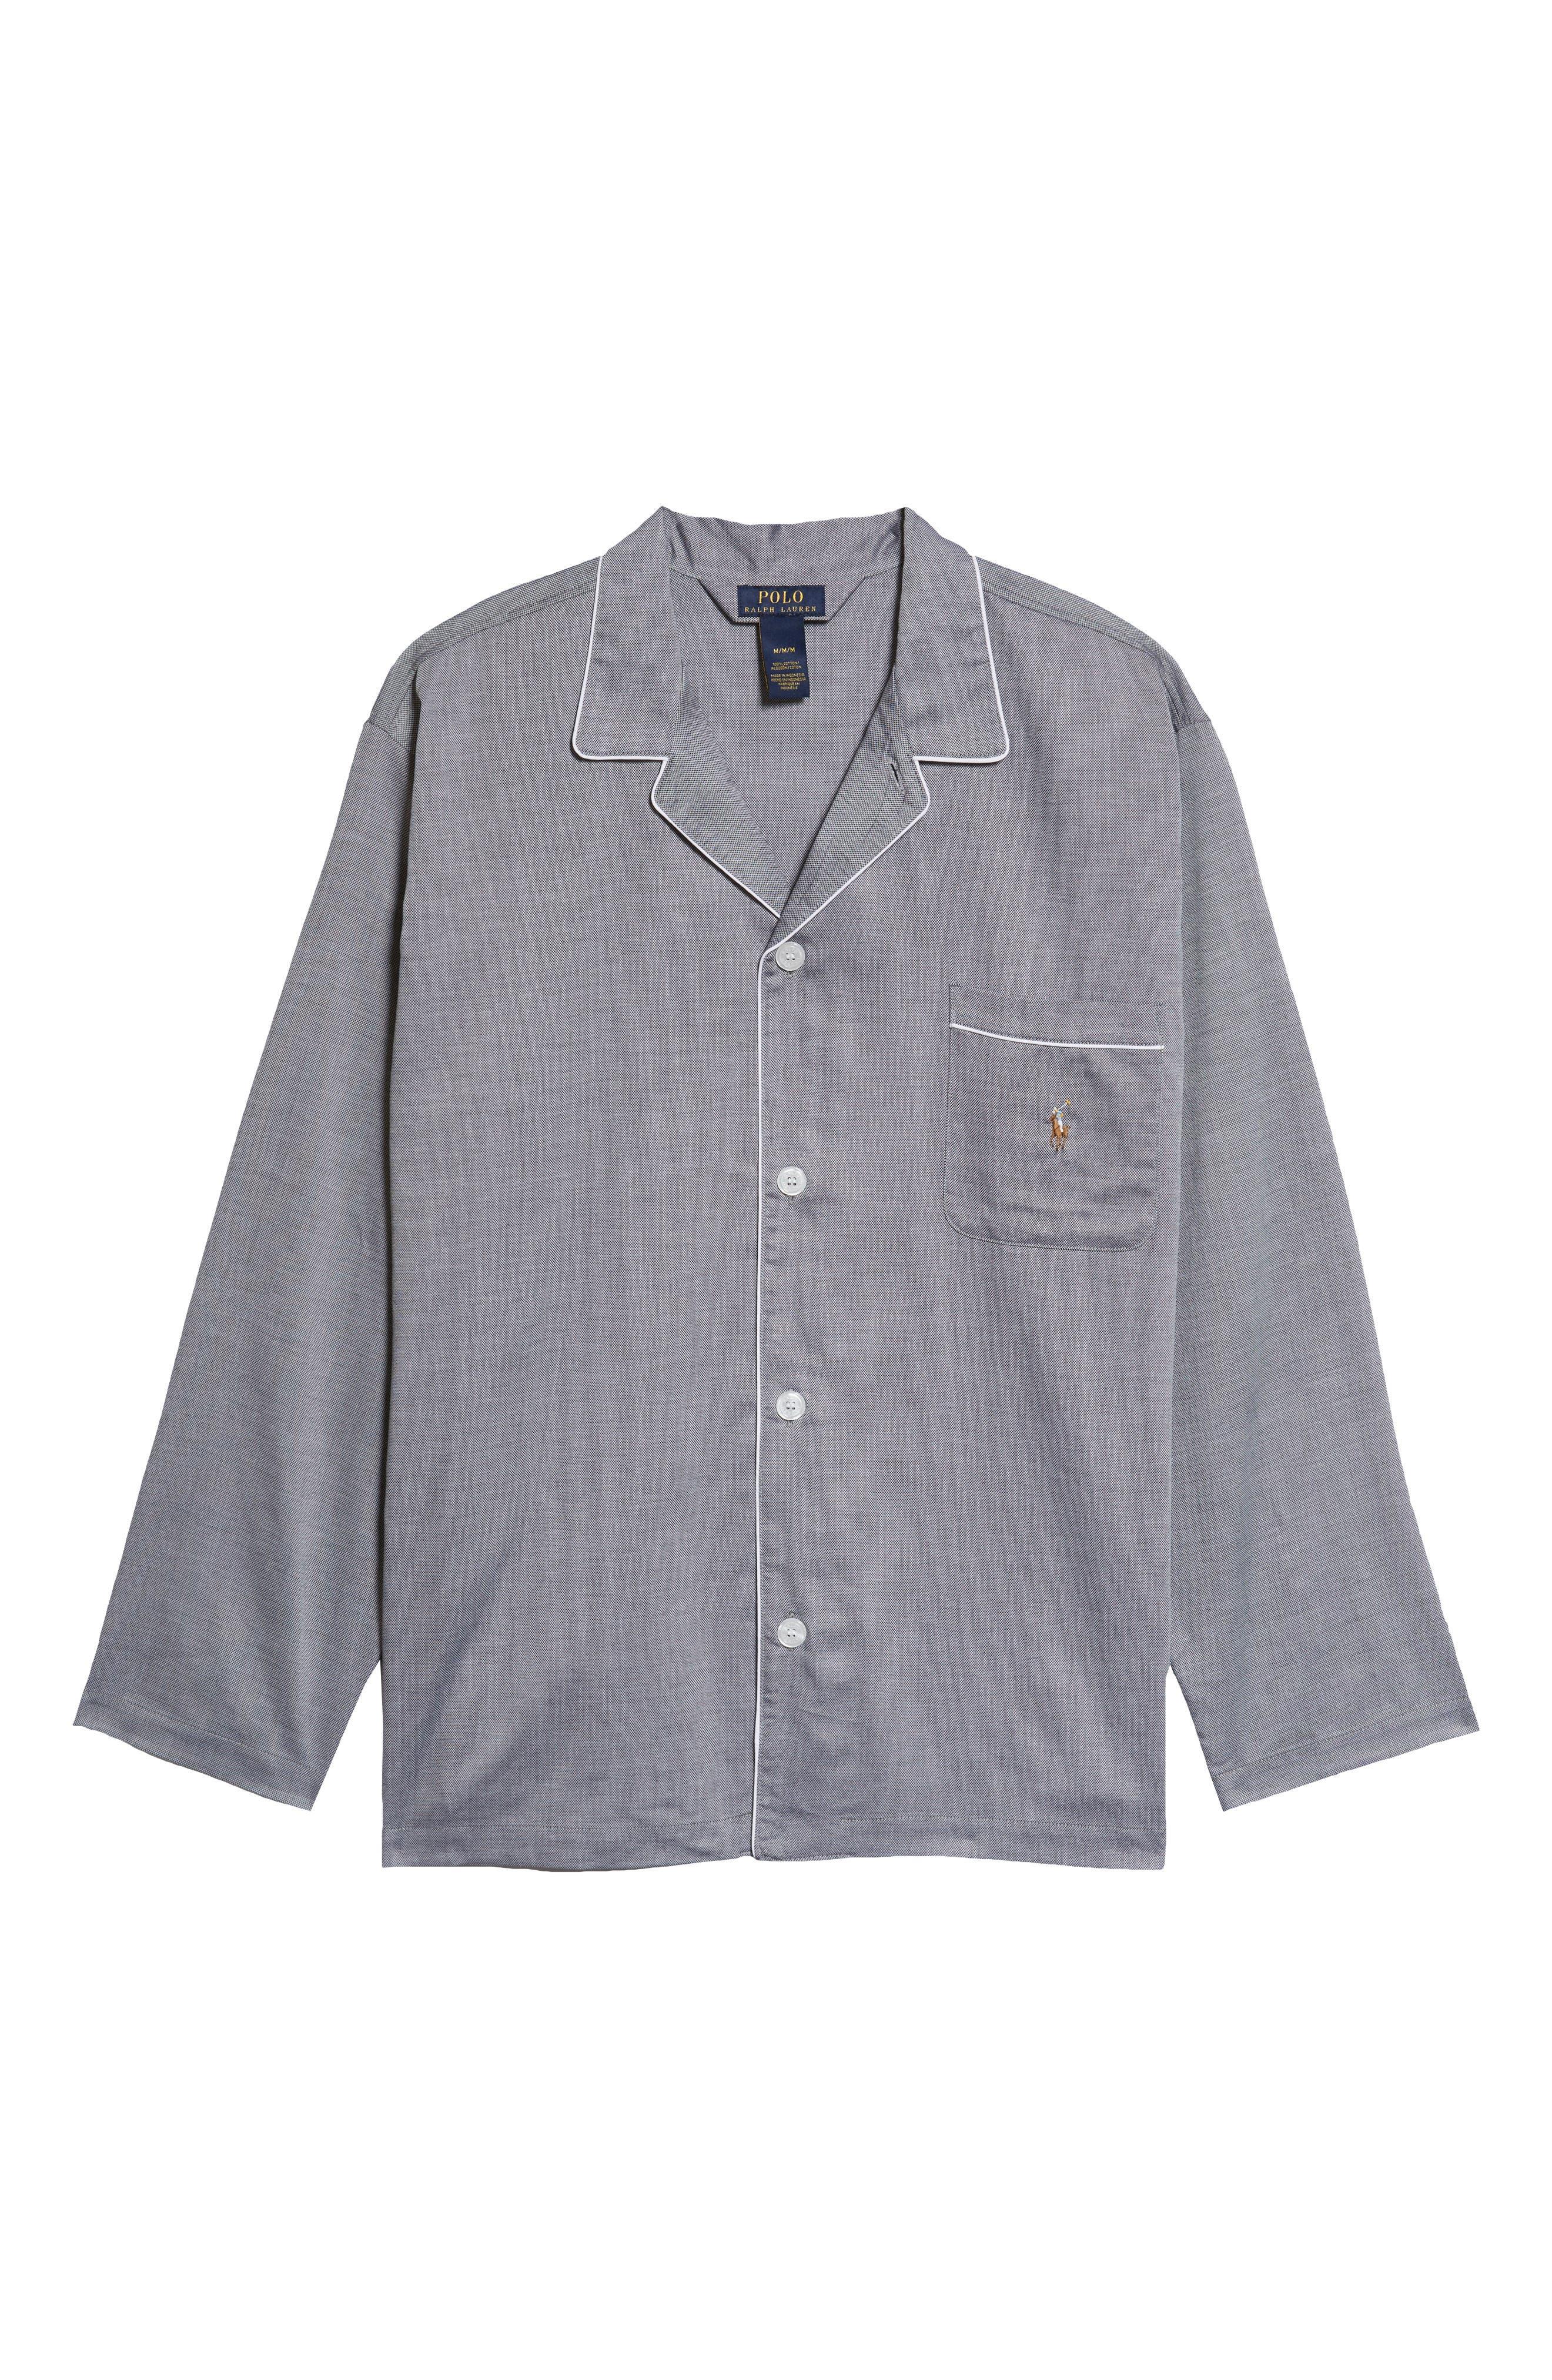 Pajama Top,                             Alternate thumbnail 7, color,                             BLACK ROYAL OXFORD